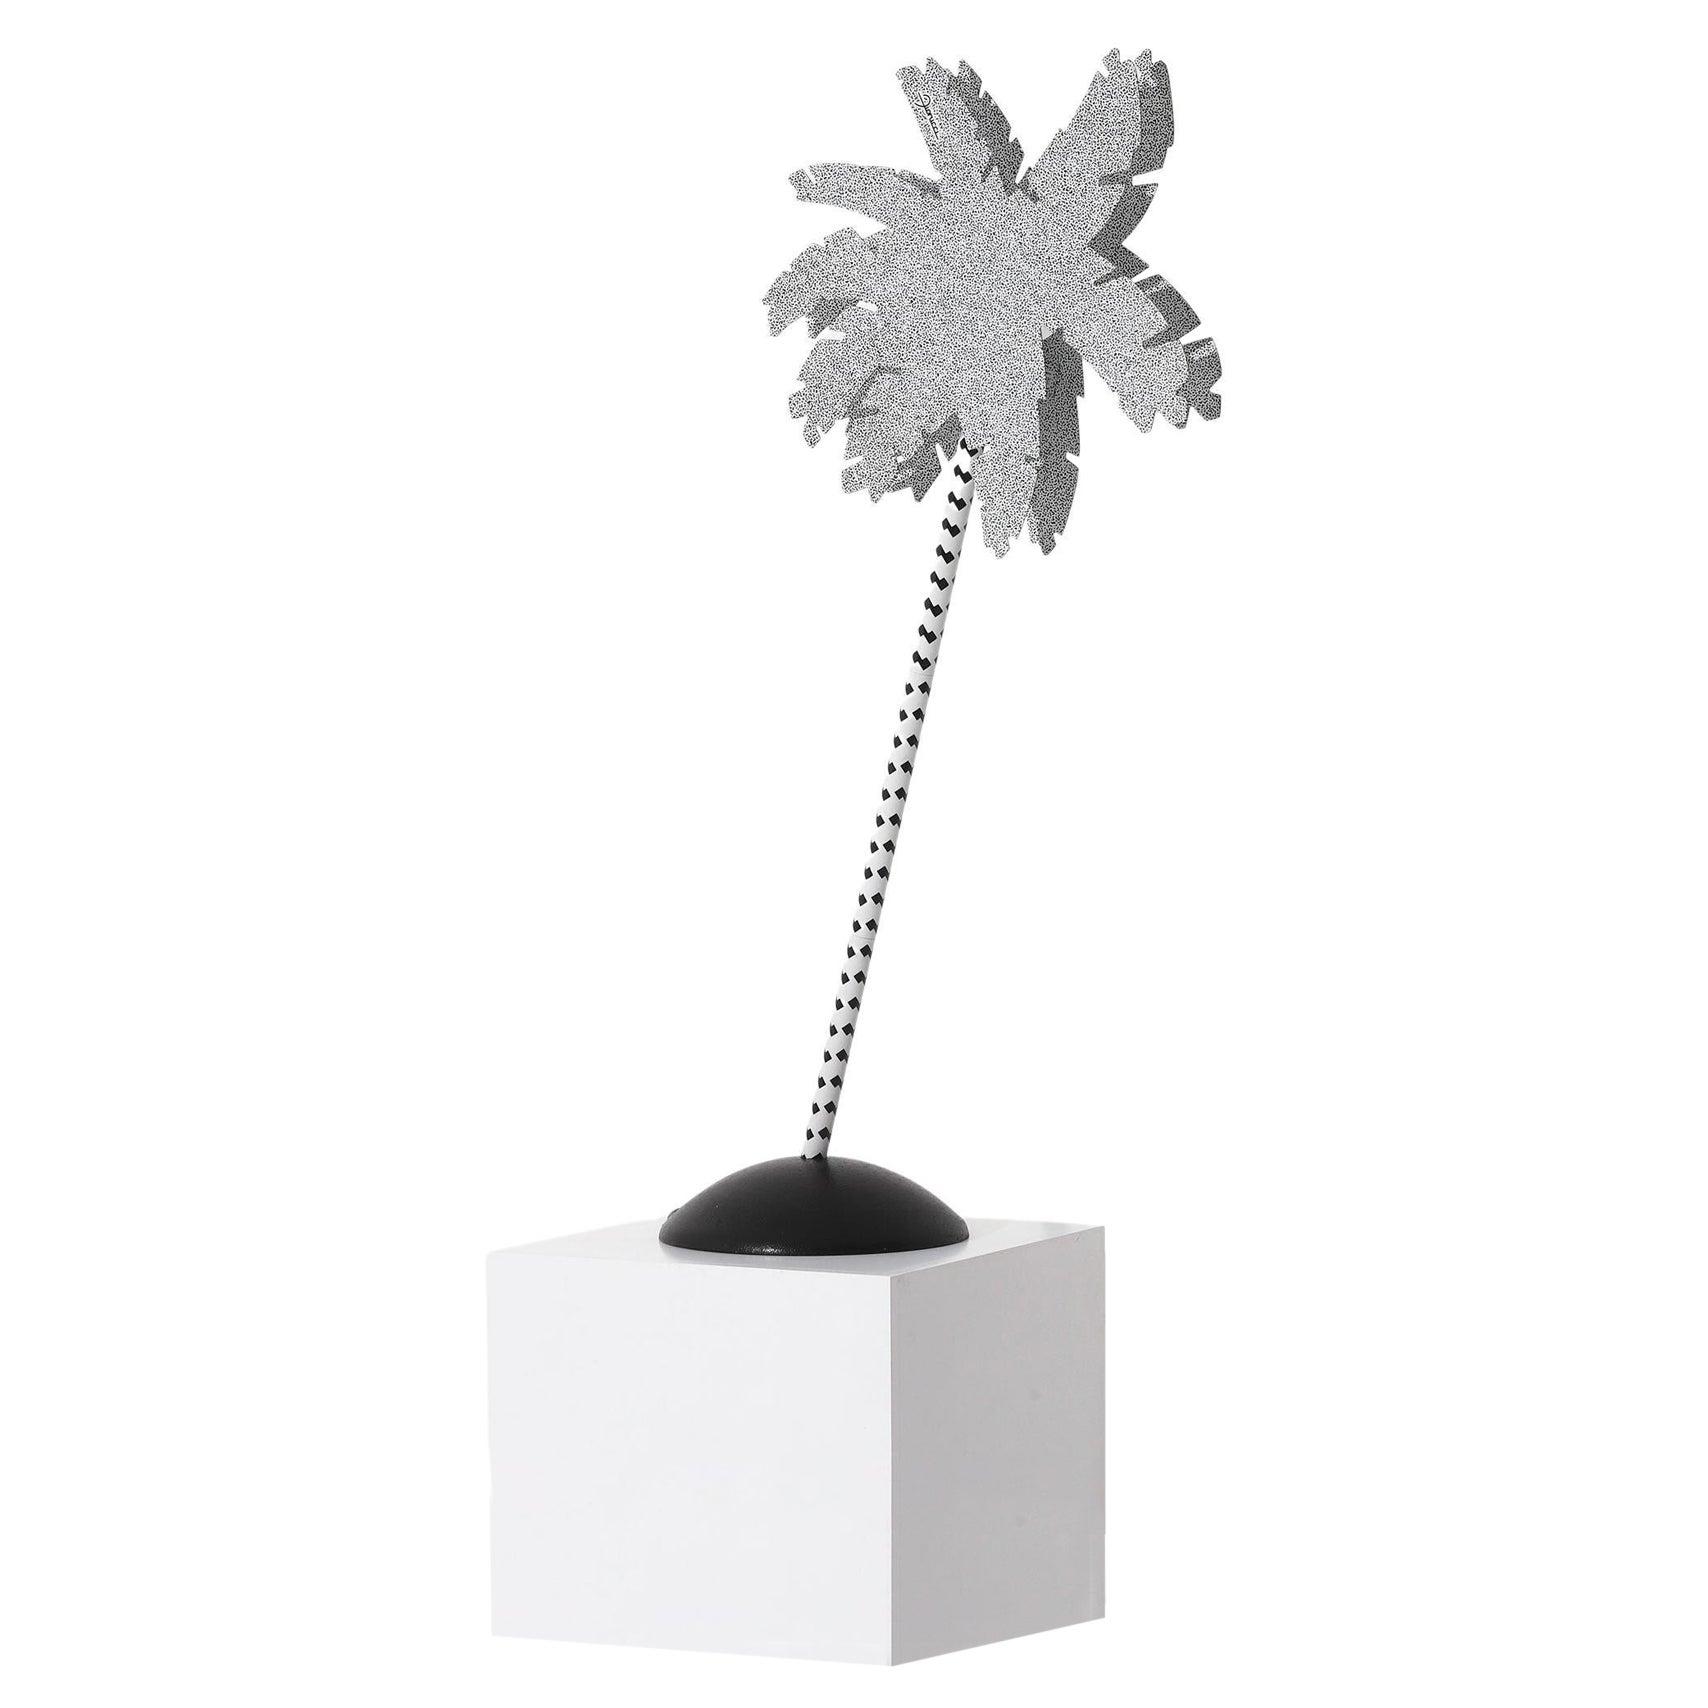 Fiorucci Caribe Targetti Sankey Table Lamp